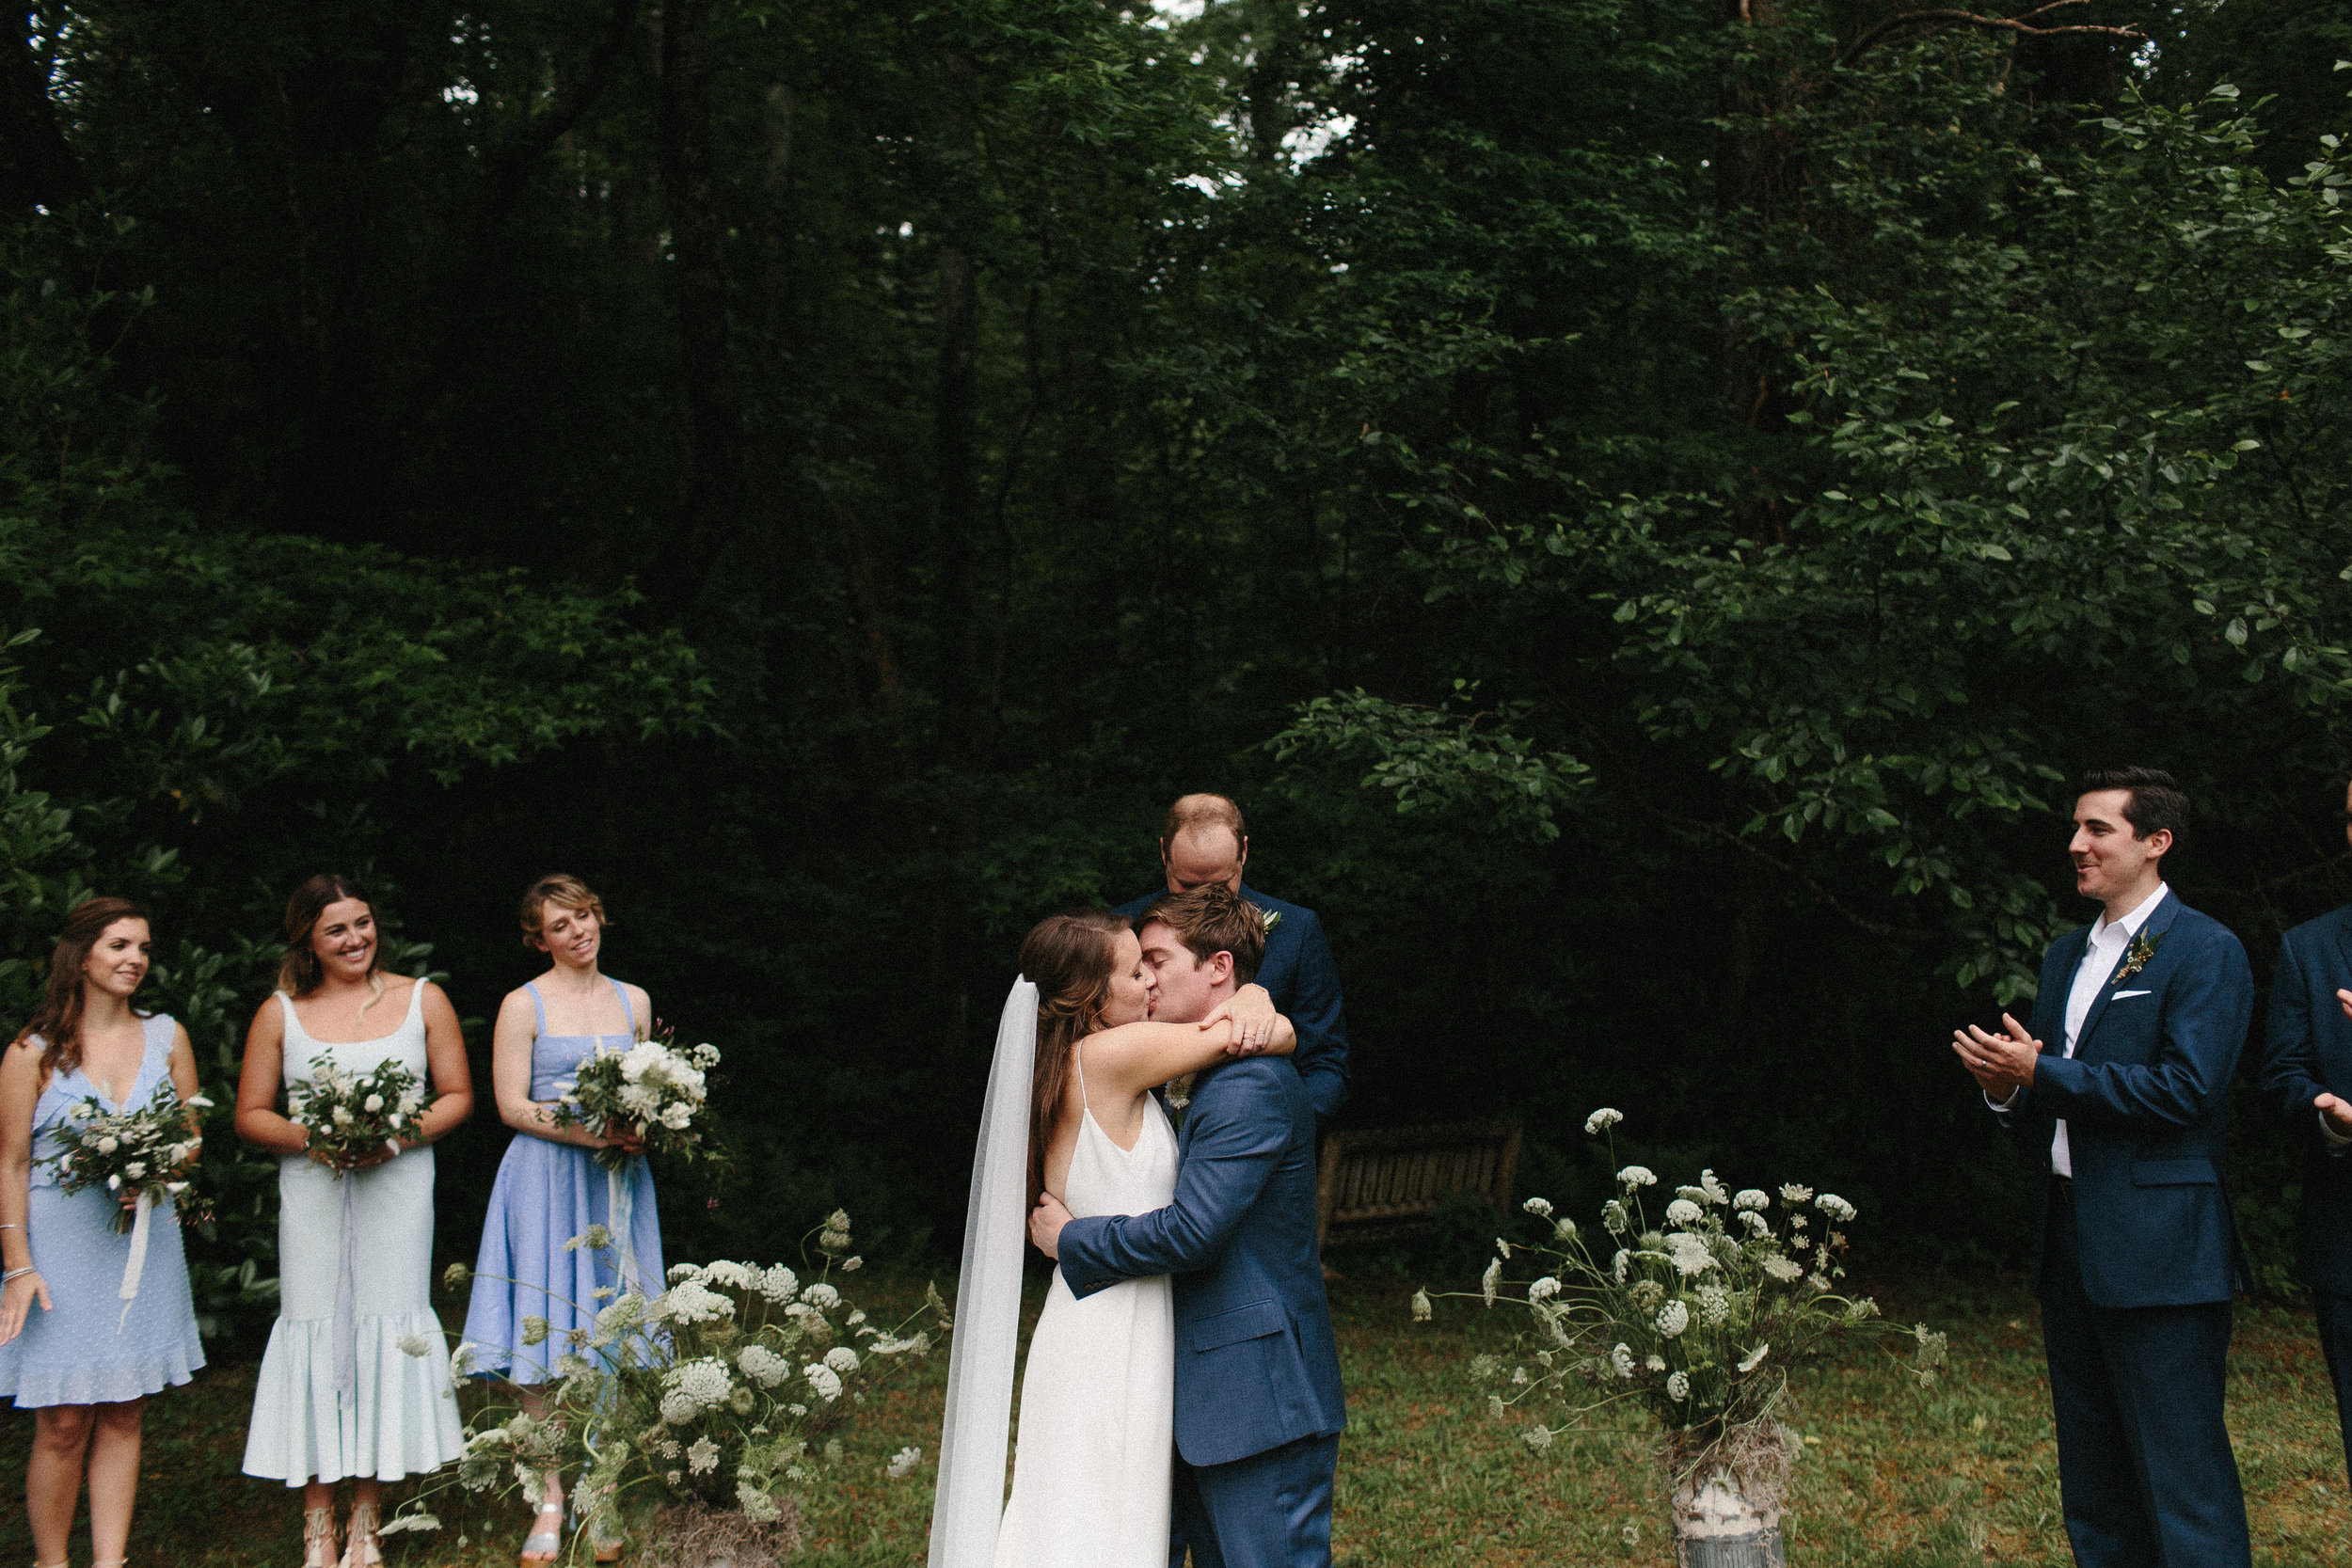 glen_ella_meadow_creekside_atlanta_wedding_photographers_1762.jpg